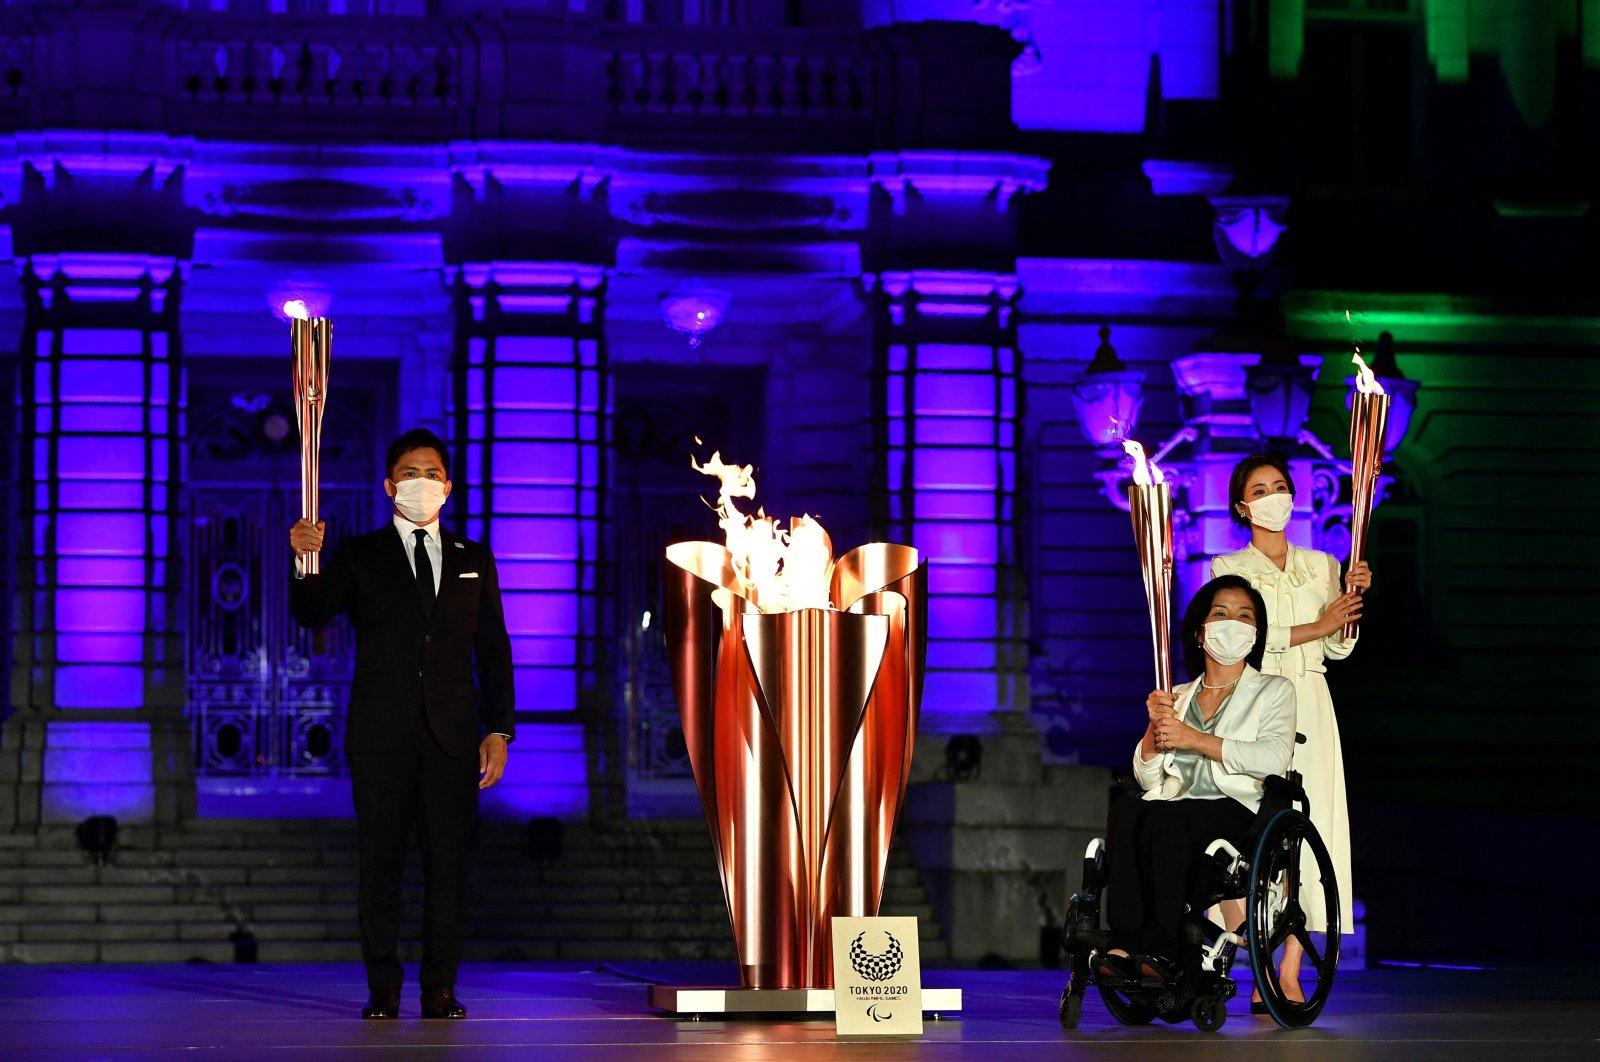 Tokyo 2020 Torch Relay Official Ambassadors Tadahiro Nomura (L), Aki Taguchi (2nd R), Satomi Ishihara (R) take part in the Paralympic Flame Lighting Ceremony at the State Guest House Akasaka Palace, Tokyo, Japan, Aug. 20, 2021. (AFP Photo)